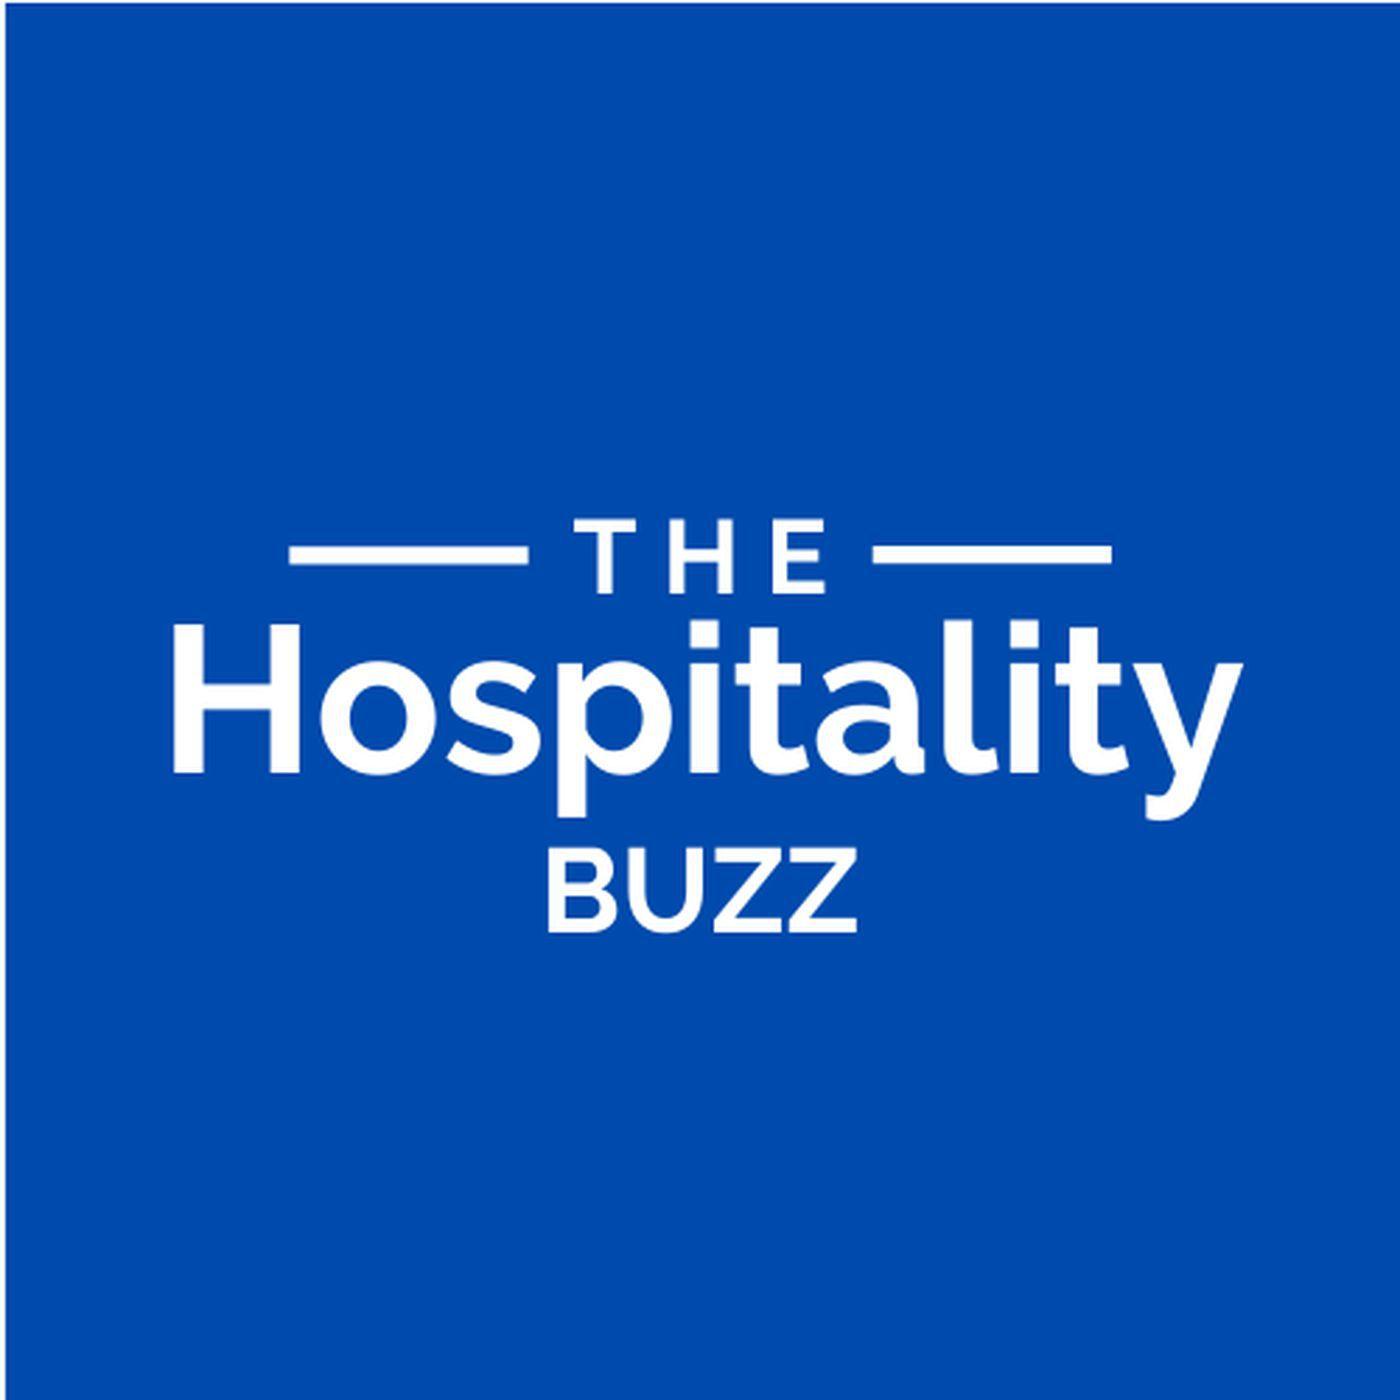 The Hospitality Buzz